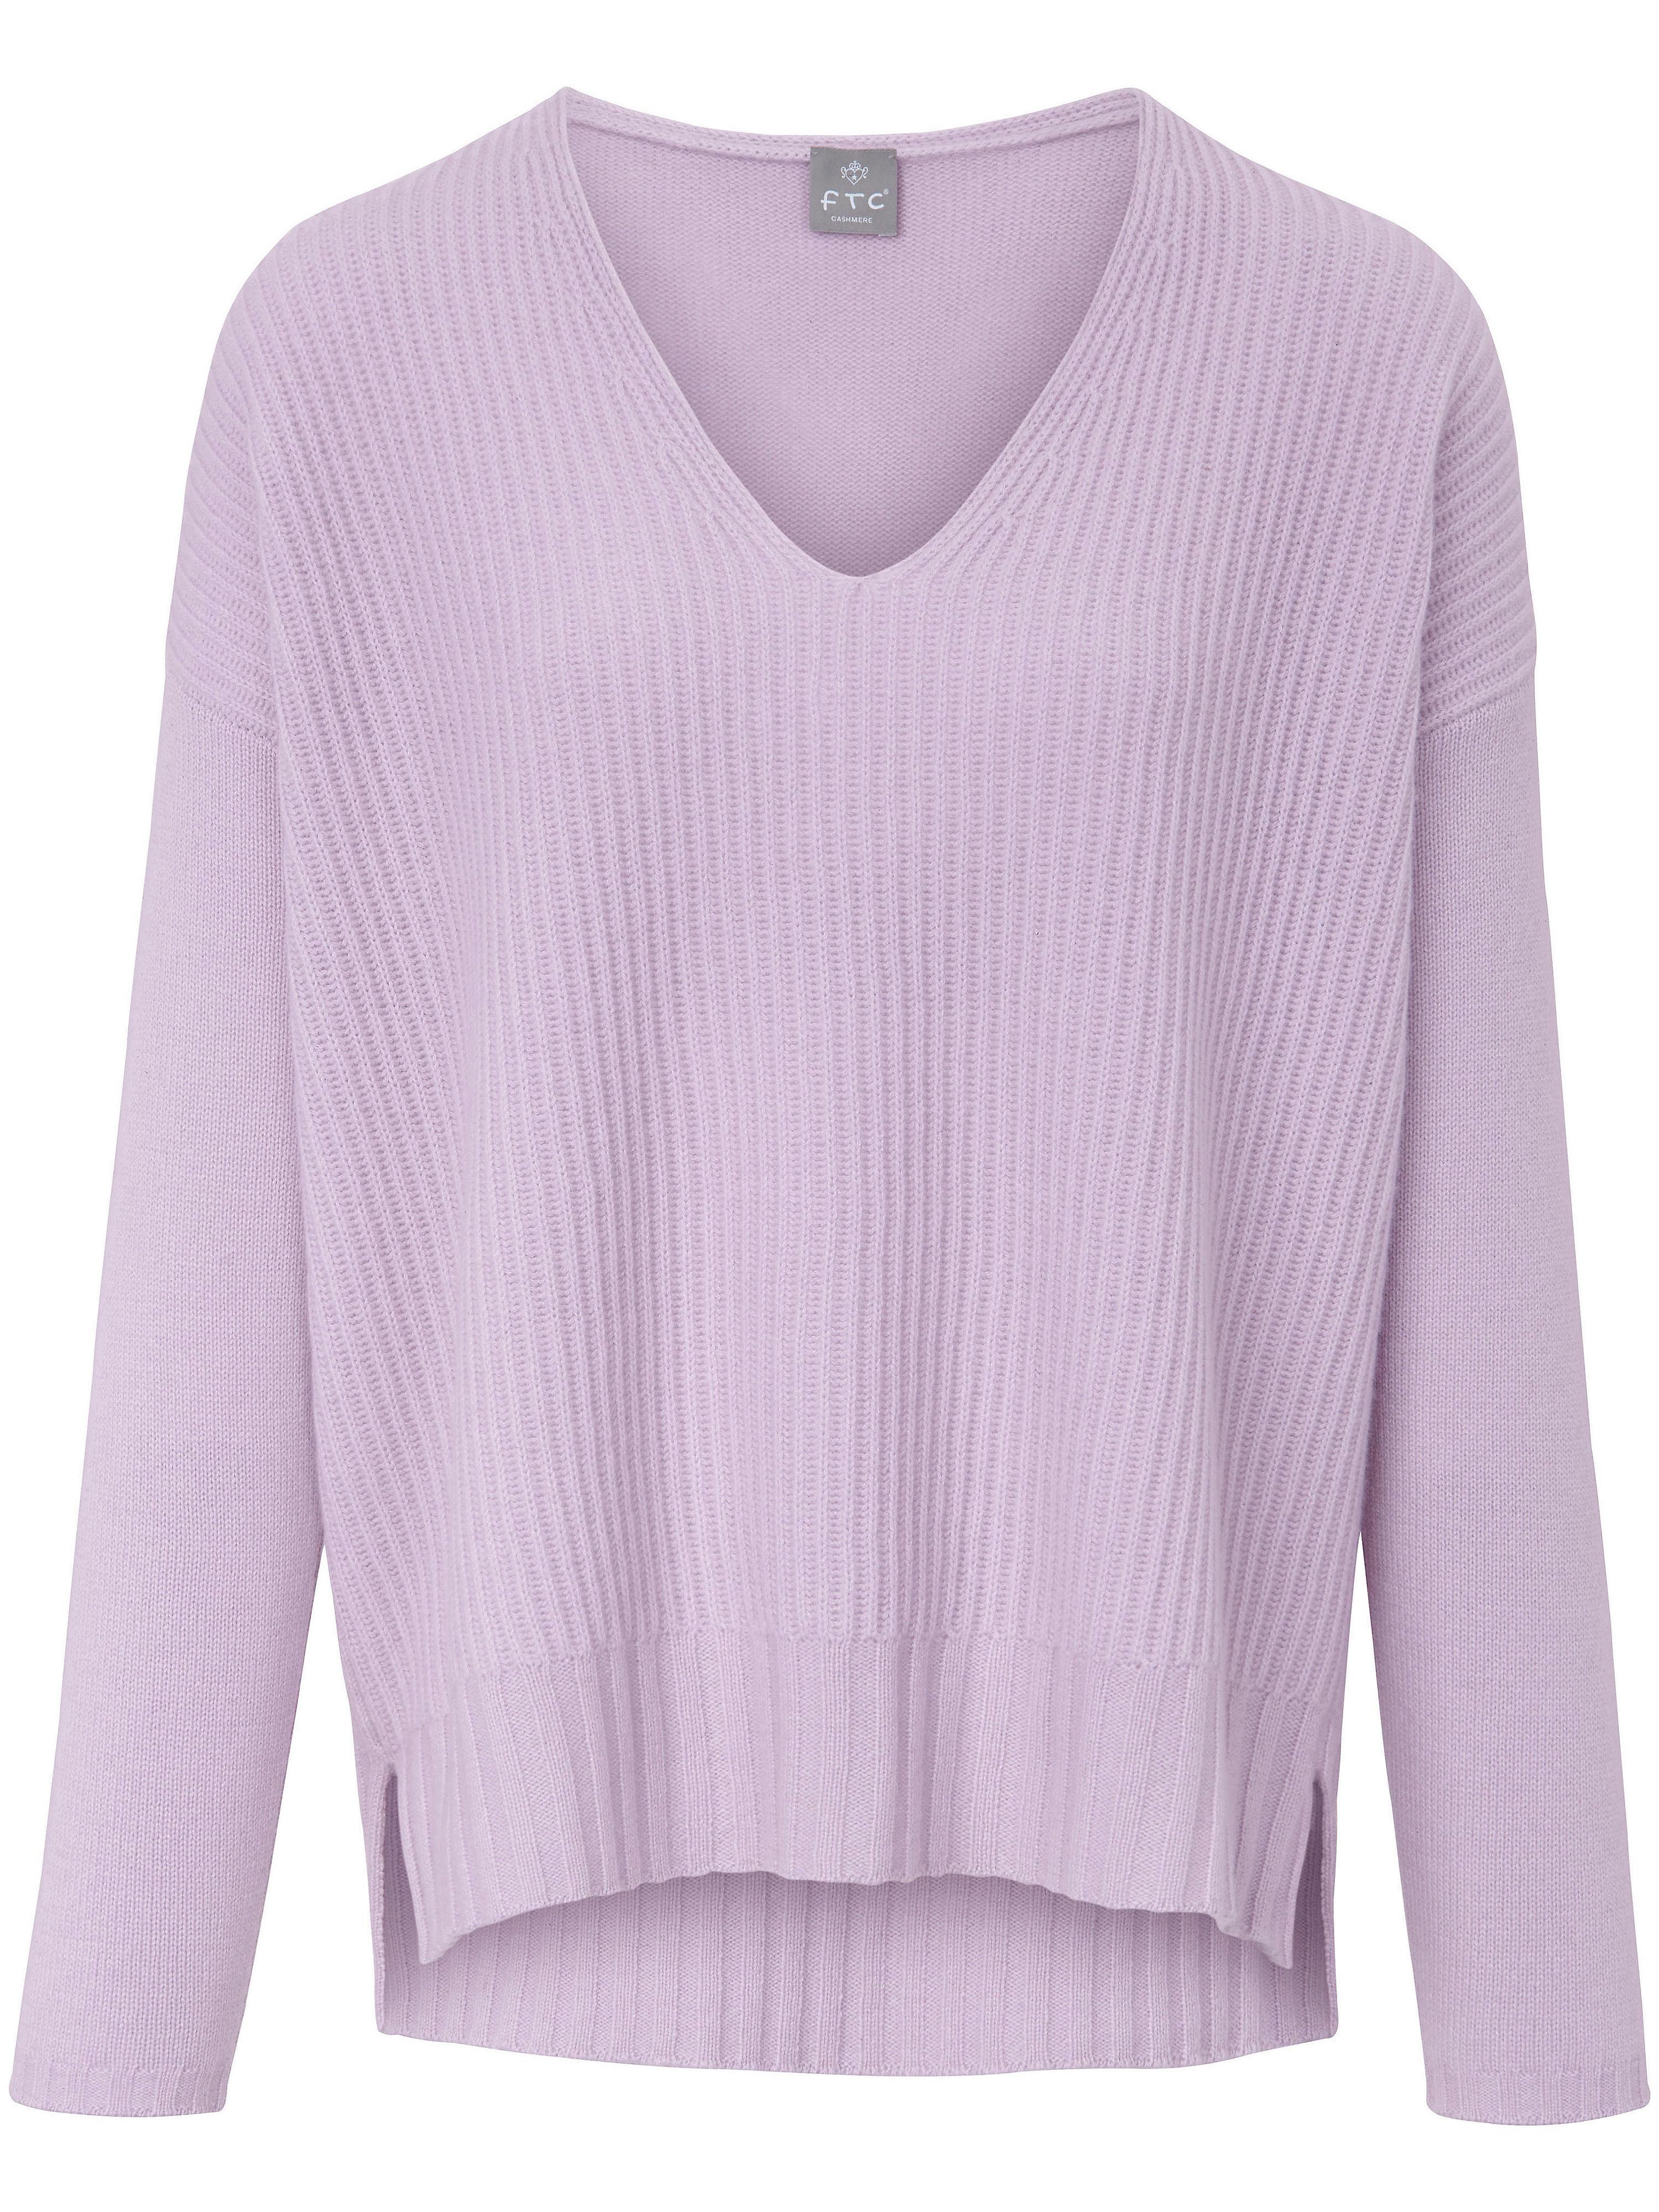 FTC Cashmere V-ringad tröja i 100% kashmir från FTC Cashmere lila